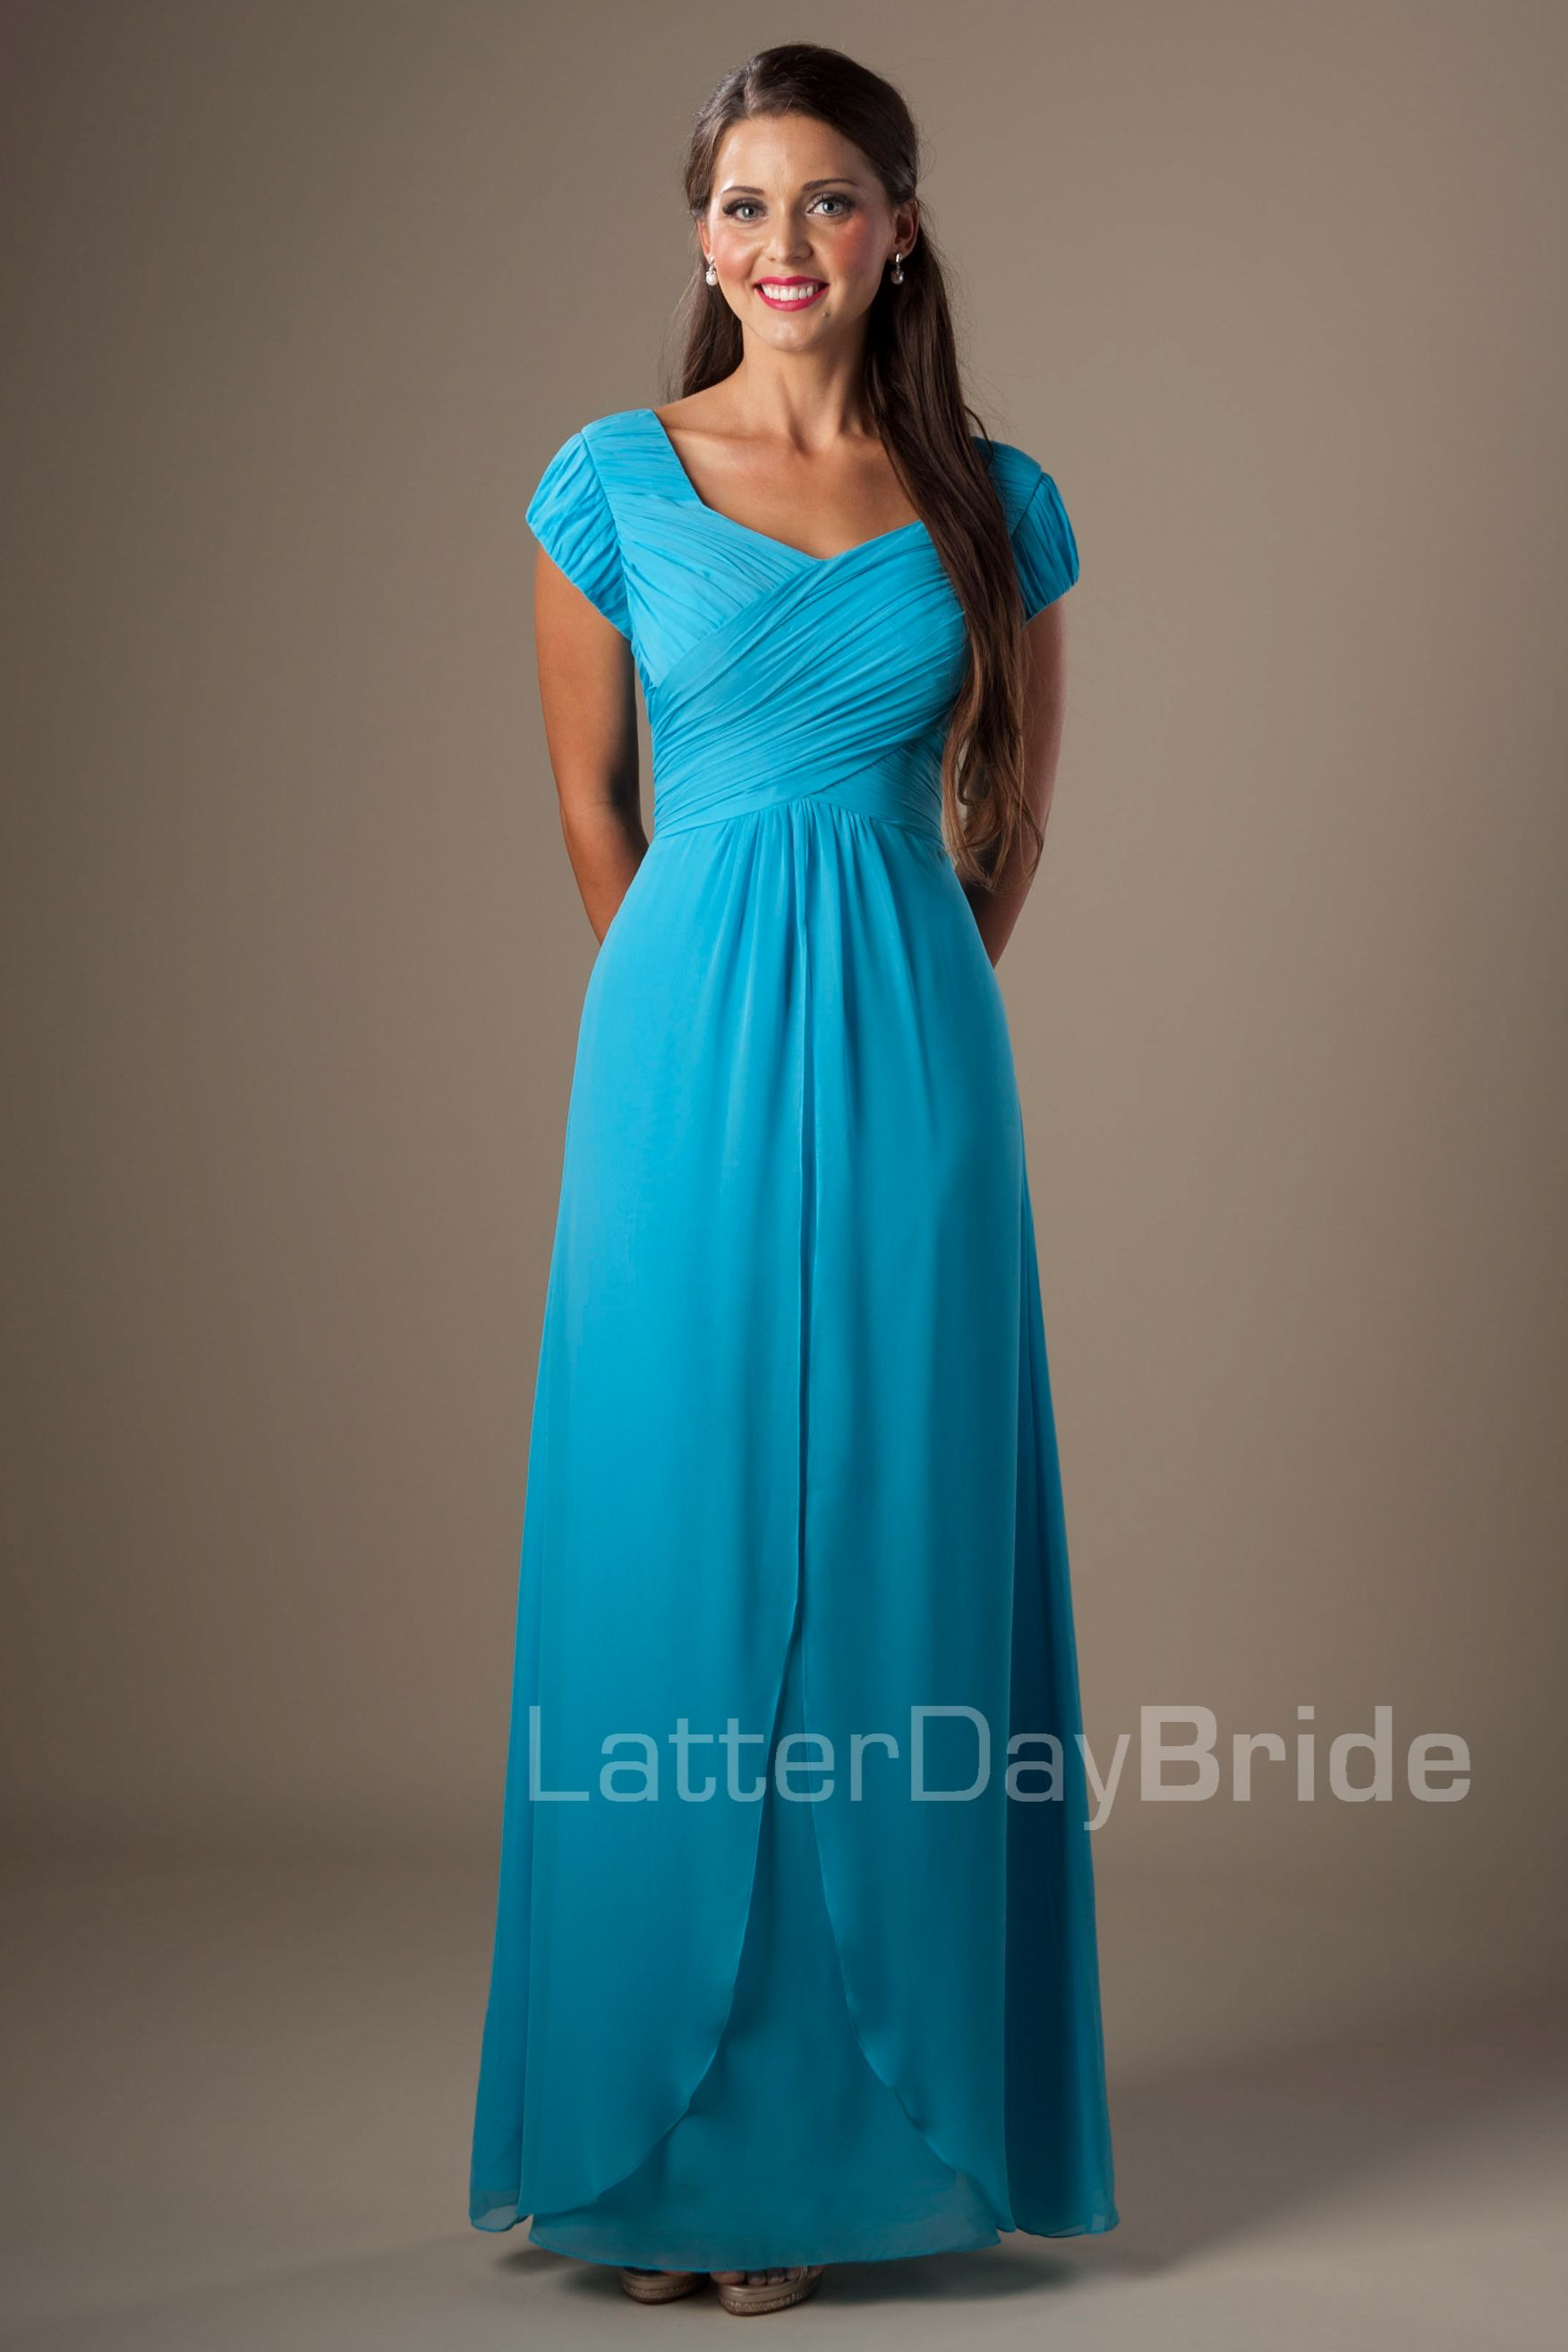 Harmony Modest bridesmaid dresses, Modest dresses